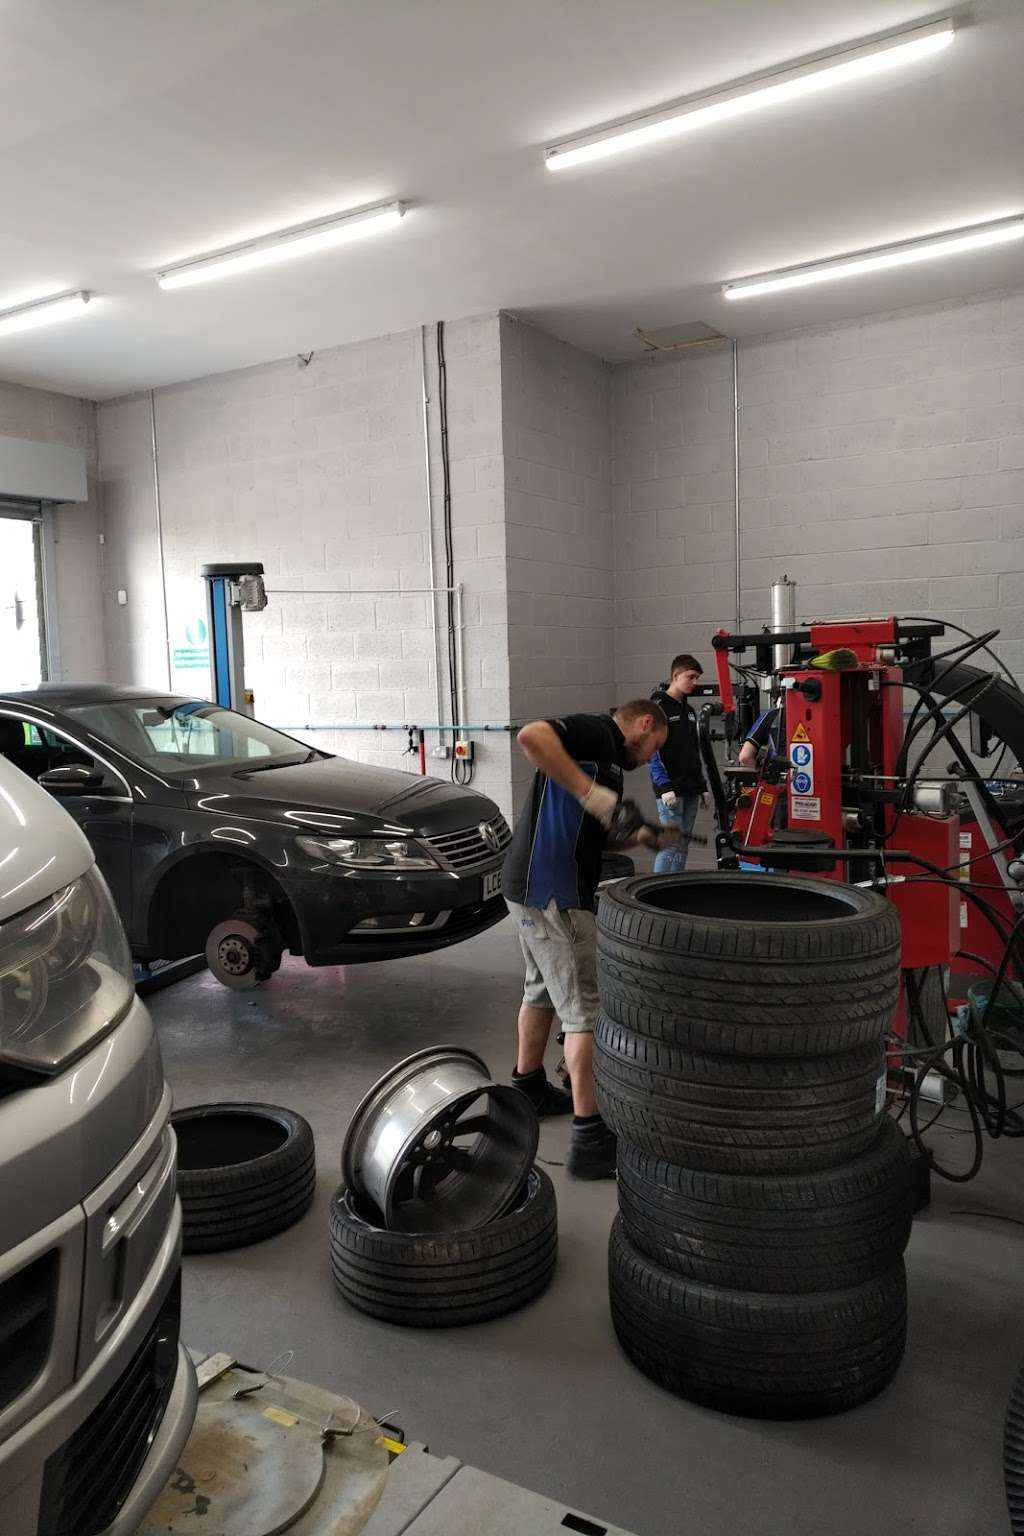 DGT Wheels & Tyres - car repair    Photo 1 of 10   Address: Wash Rd, Basildon SS15 4BT, UK   Phone: 01268 416201